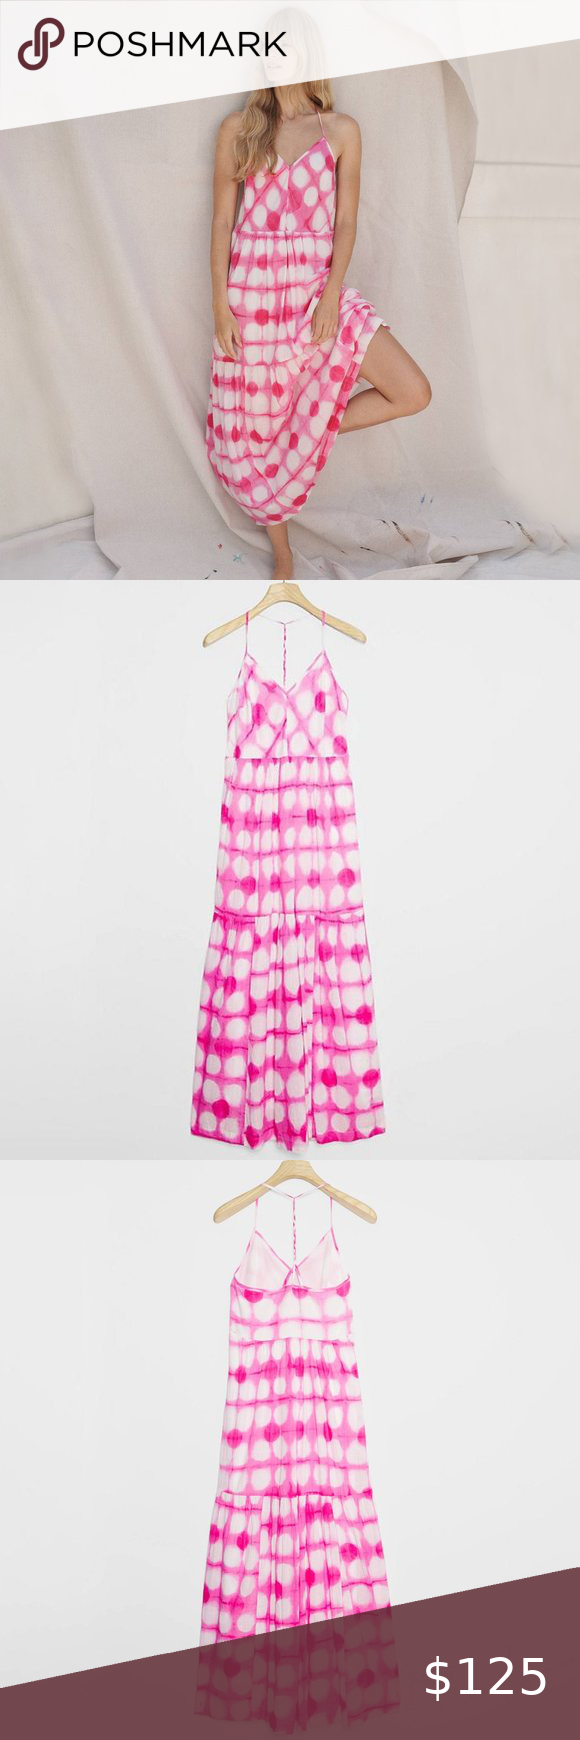 Anthropologje Geneva Maxi Dress Maxi Dress Anthropologie Maxi Dress Maxi Wrap Dress [ 1740 x 580 Pixel ]